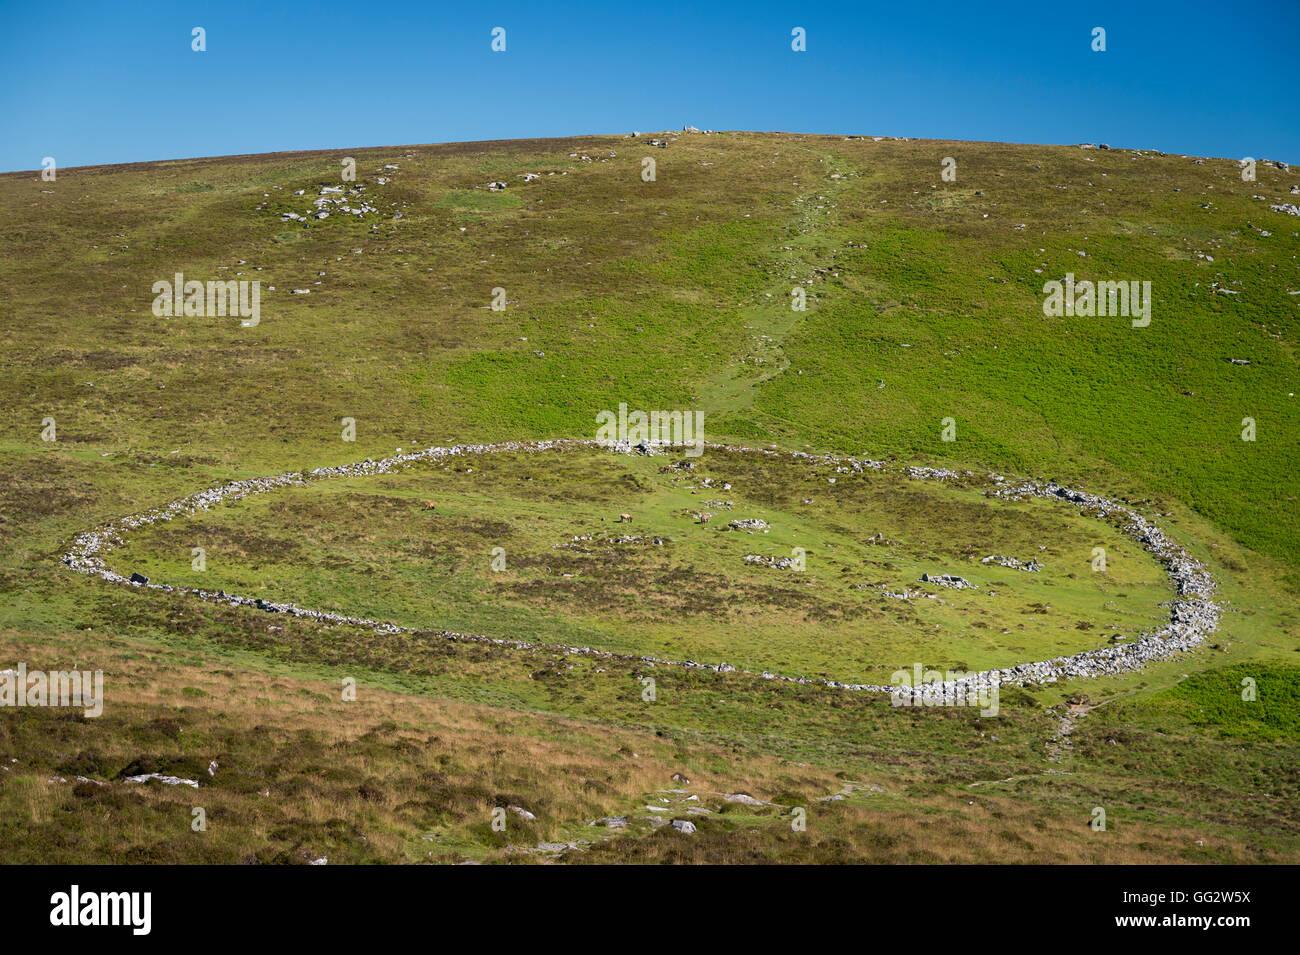 Prehistoric Remains Imágenes De Stock & Prehistoric Remains Fotos De ...